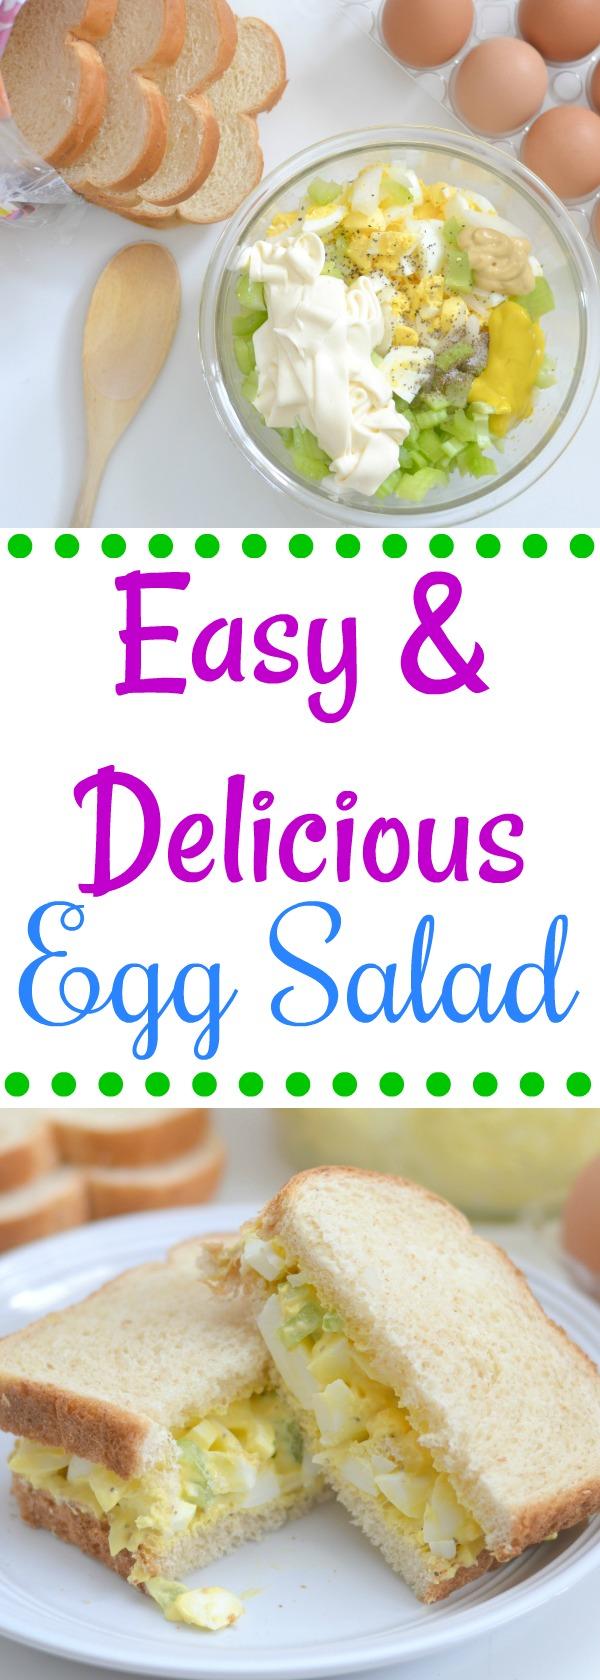 Easy & Delicious Egg Salad, egg salad recipe, egg salad, easy egg salad recipe, the best egg salad recipe, egg salad sandwich, how to make egg salad, sandwiches,